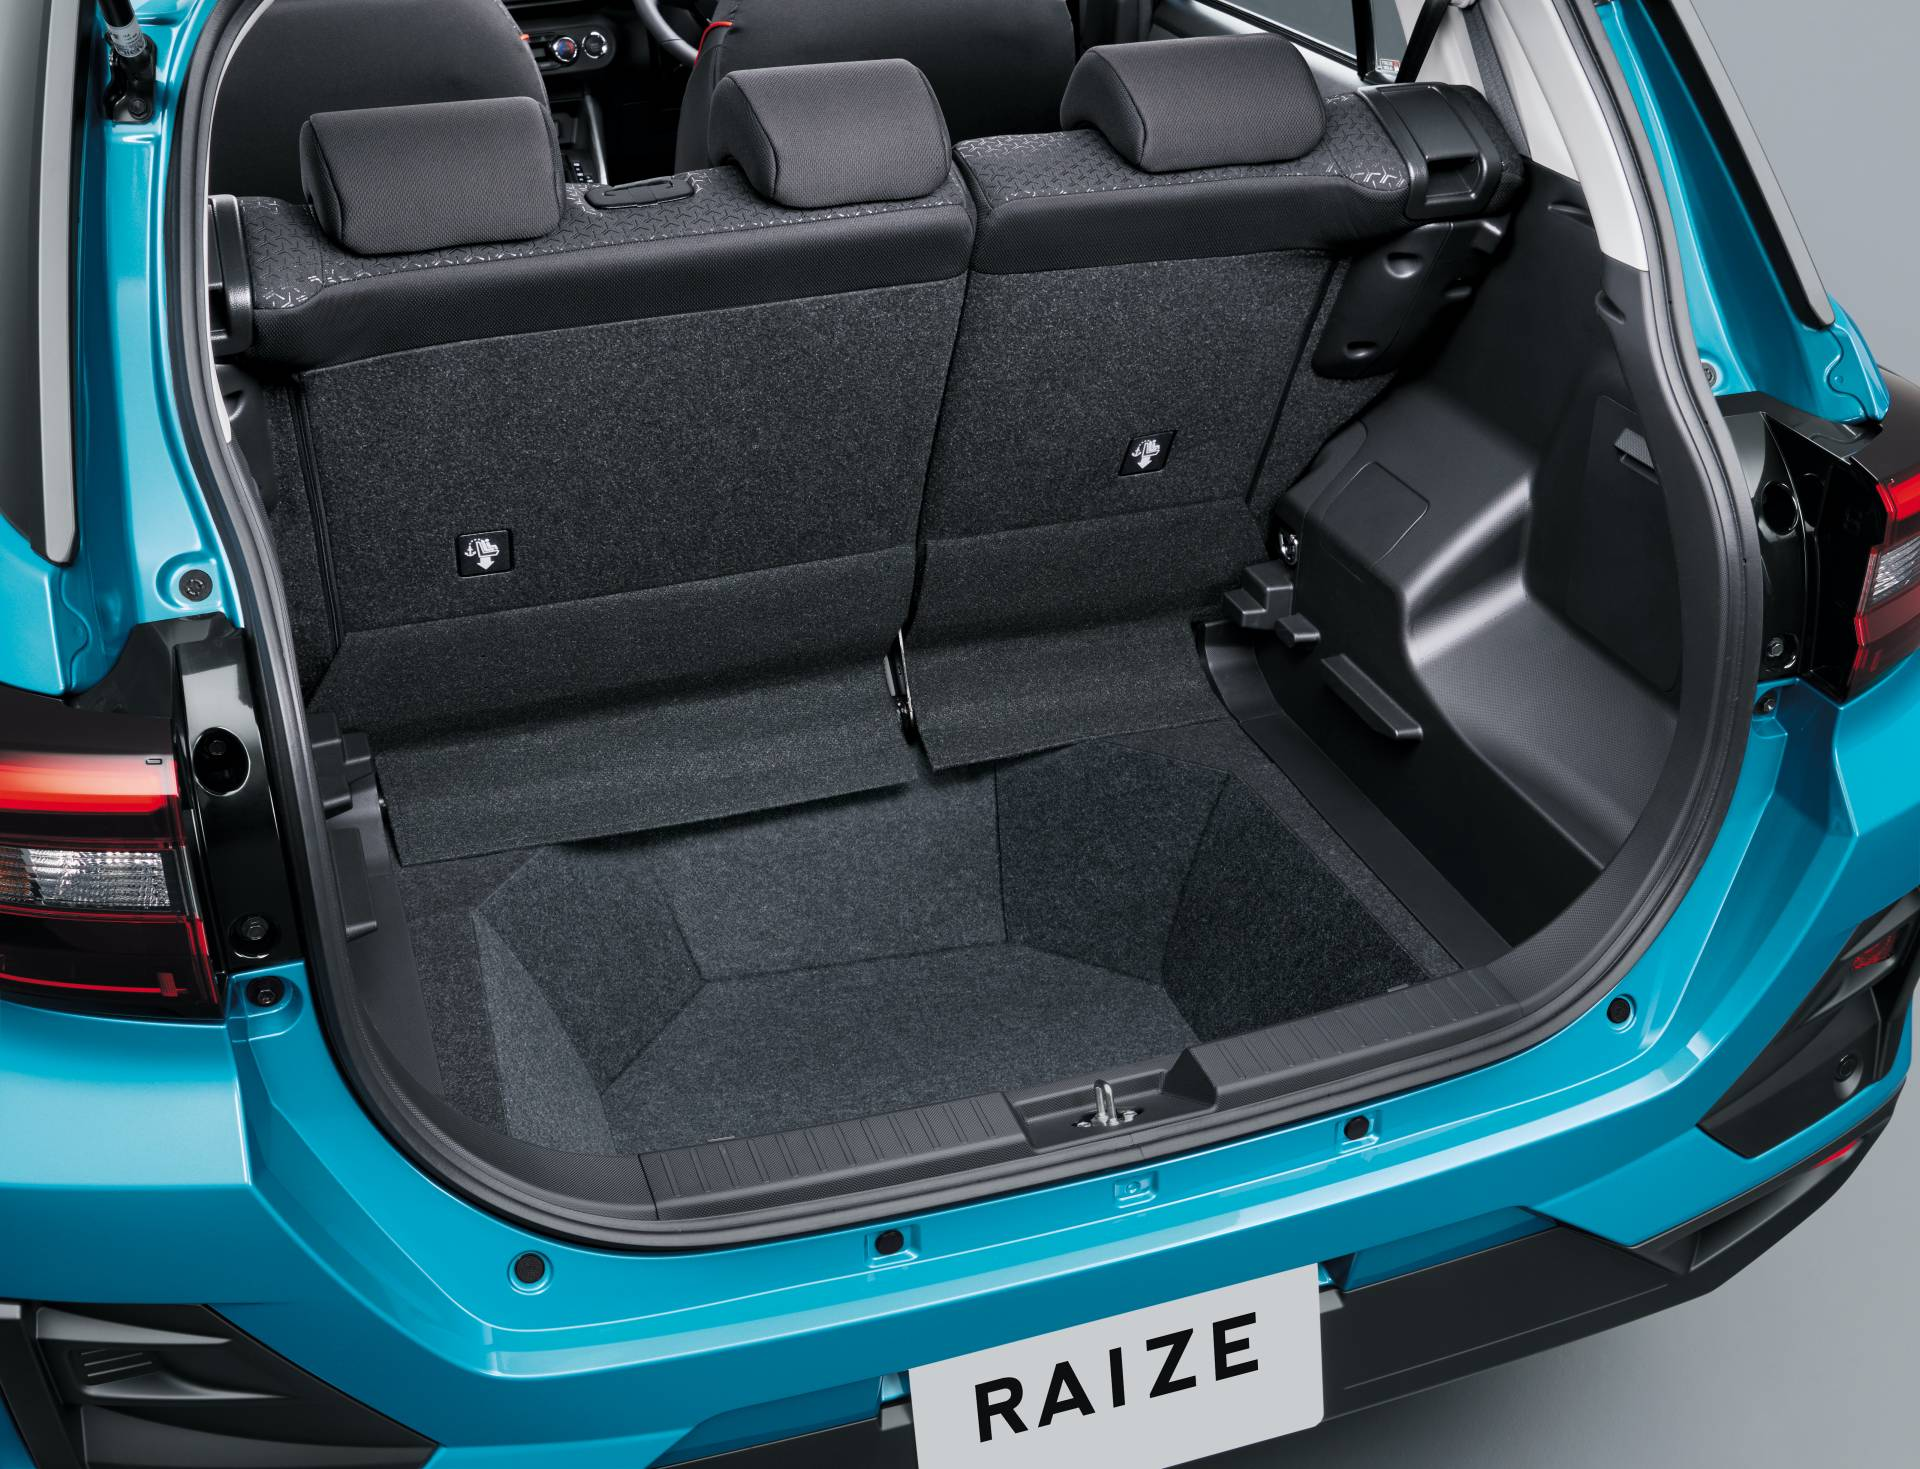 2020_Toyota_Raize_0012